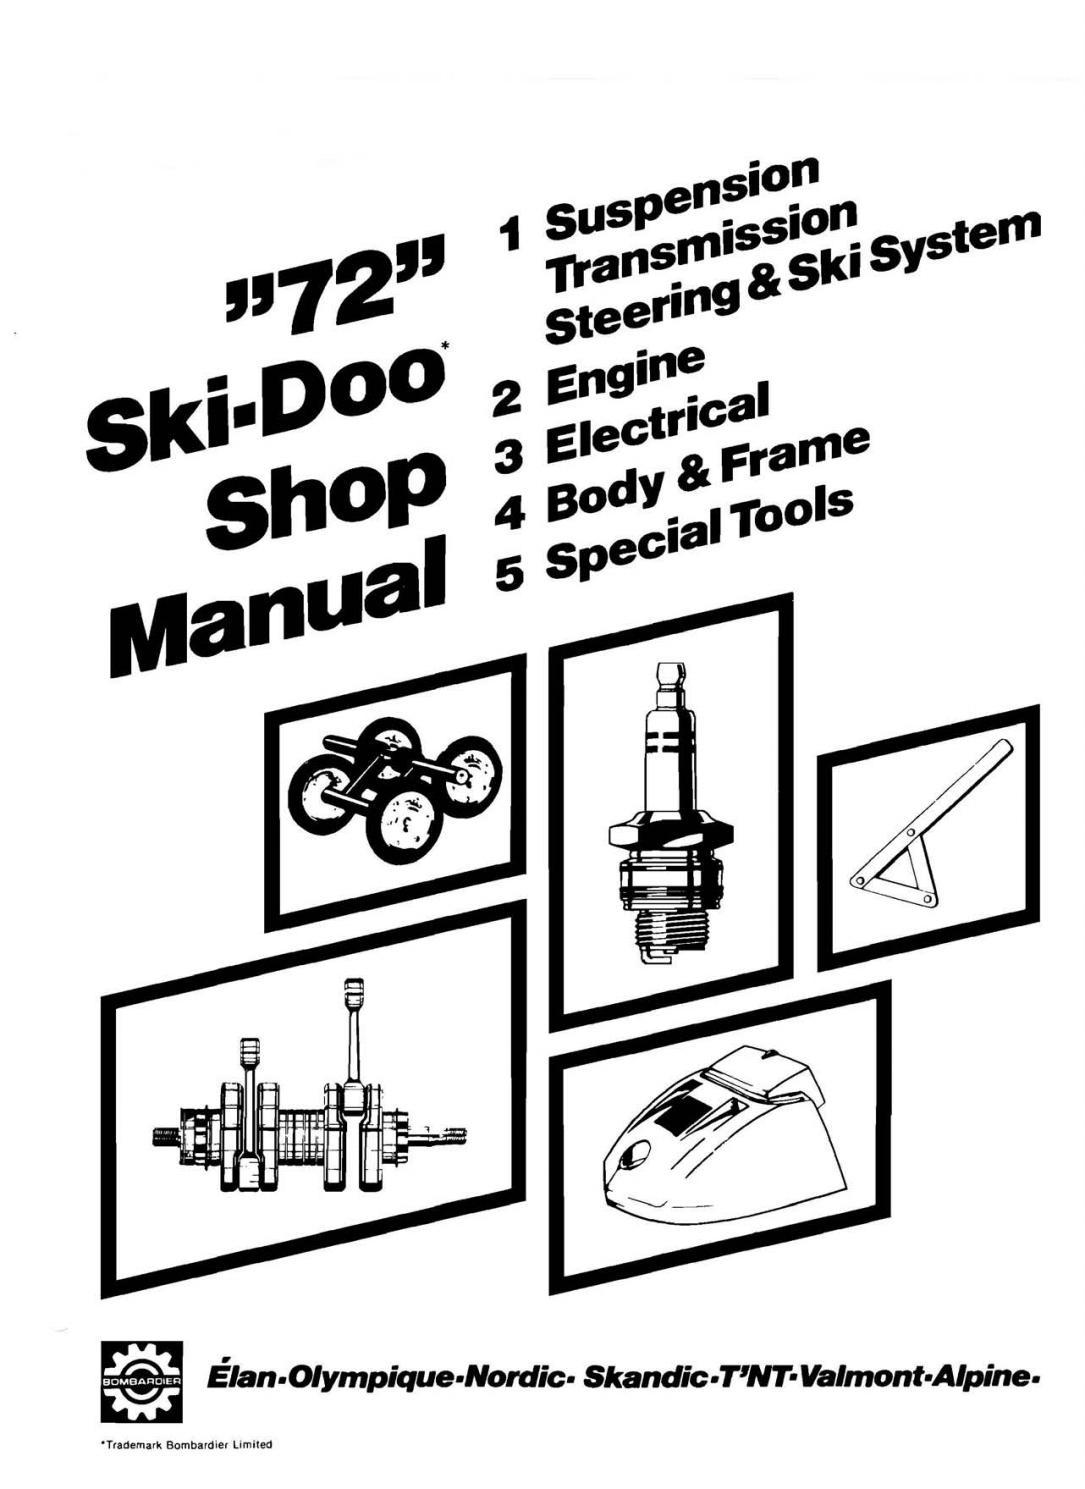 1972 1973 Bombardier Ski Doo Snowmobile Repair Shop Manual Download Pdf By Heydownloads Issuu